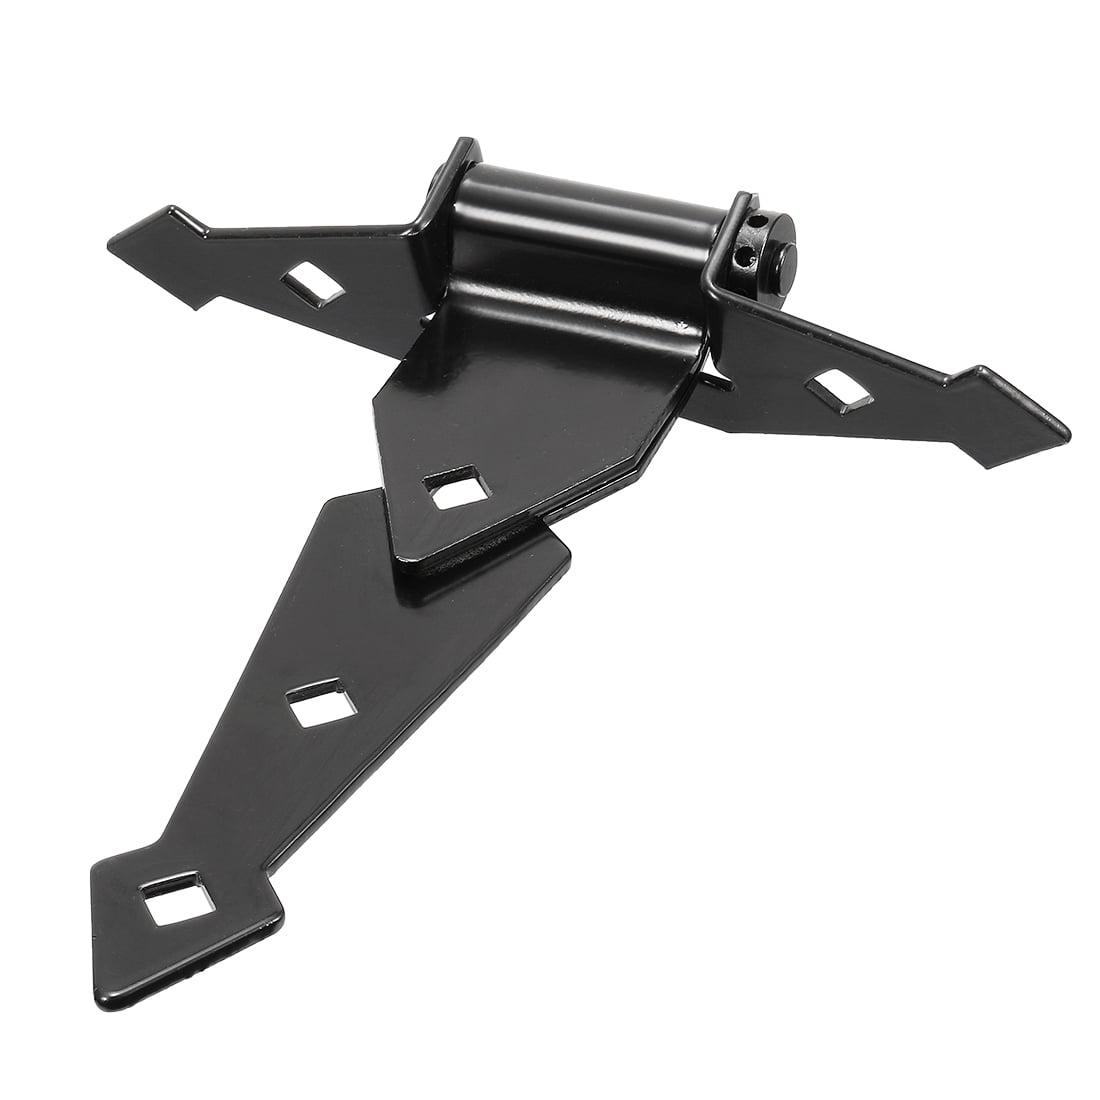 "Unique Bargains 8"" Carbon Steel Zinc Plated Rustproof Thicker 44lbs T Strap Door Hinge Black - image 2 of 4"